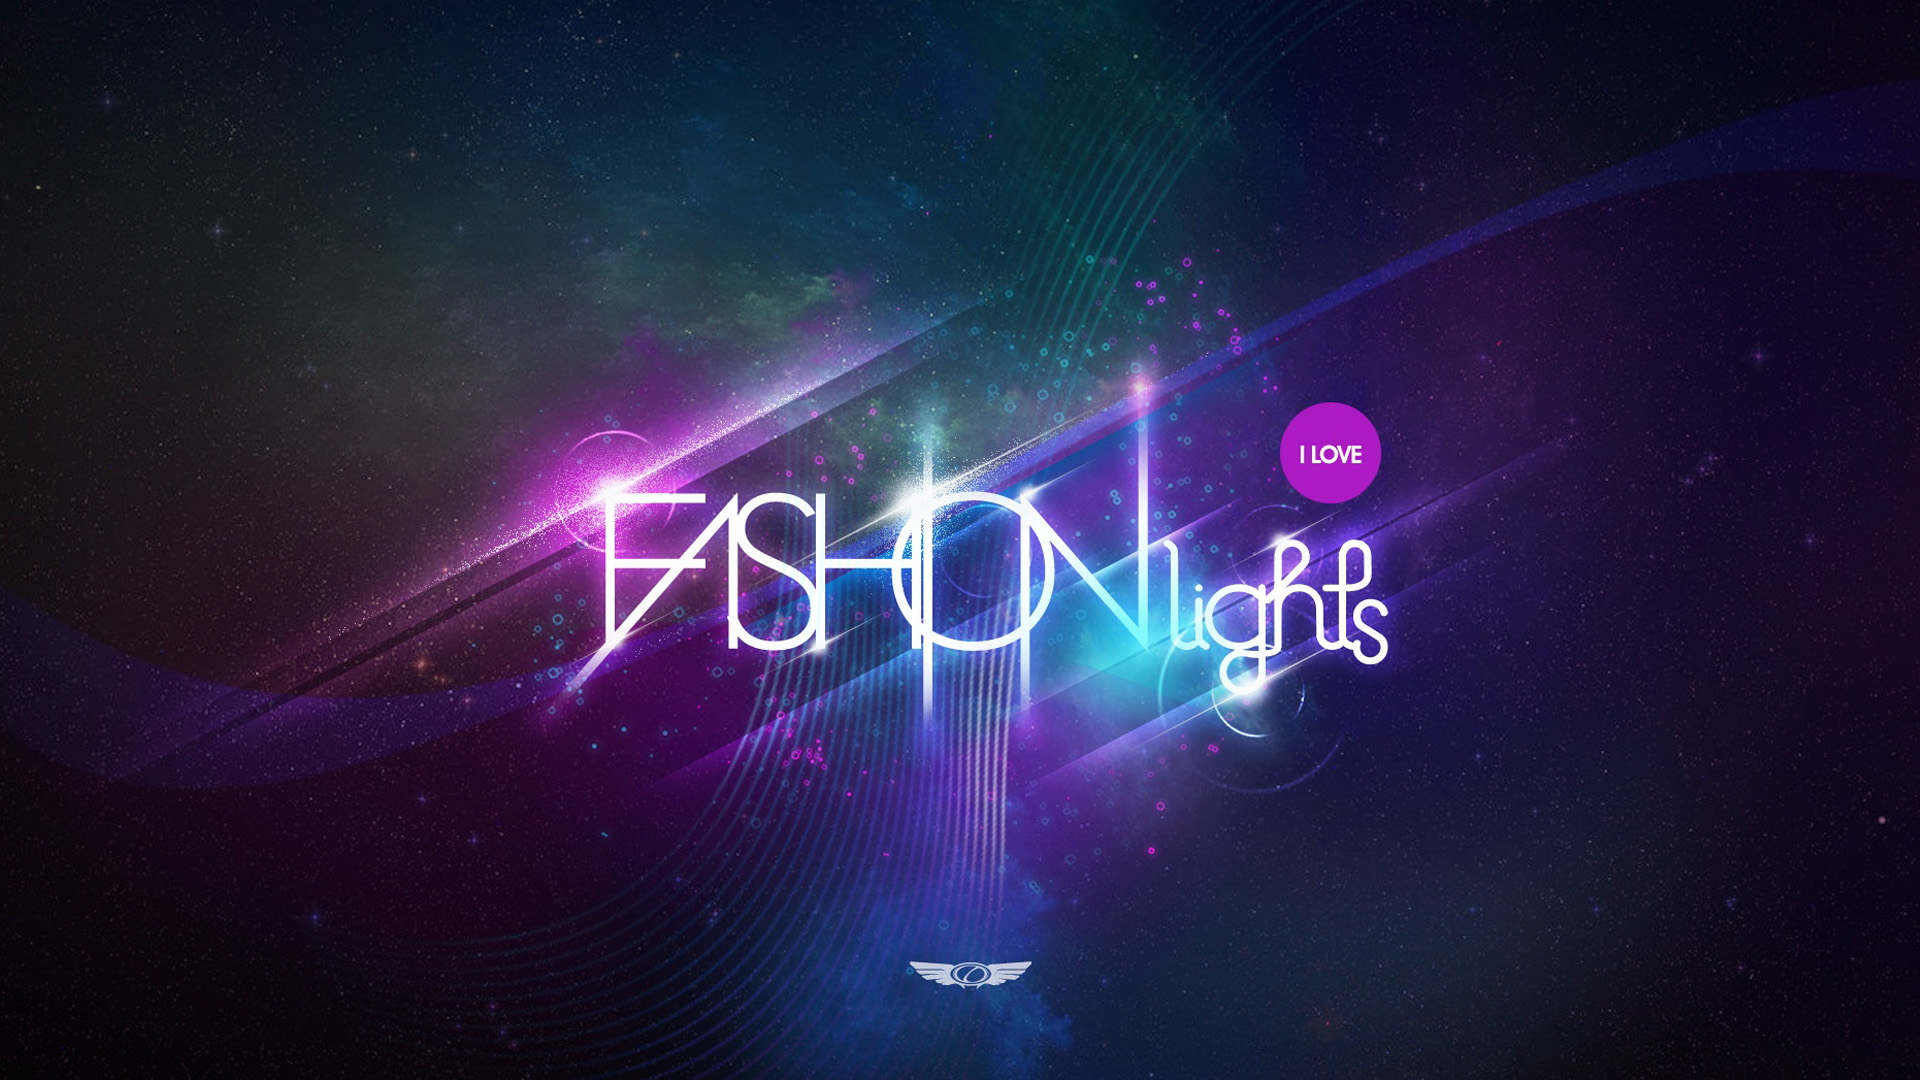 Neon lights background wallpapersafari - Is wallpaper in style ...